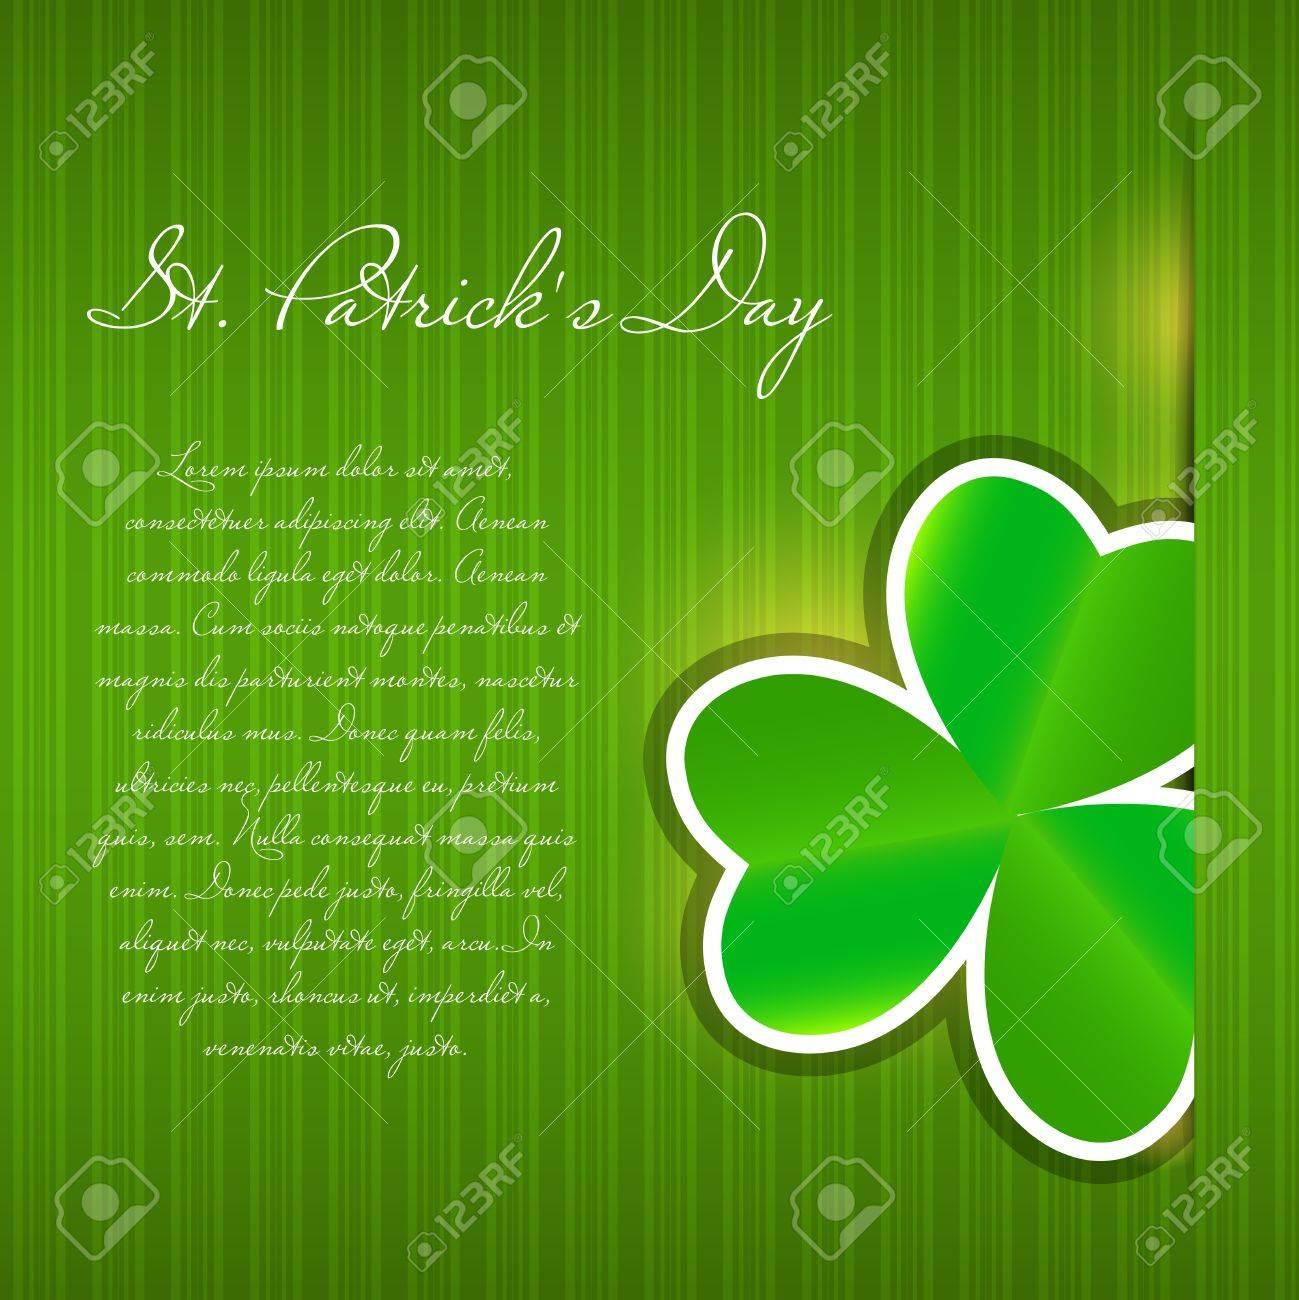 Saint Patrick s day background vector illustration Stock Illustration - 17285754